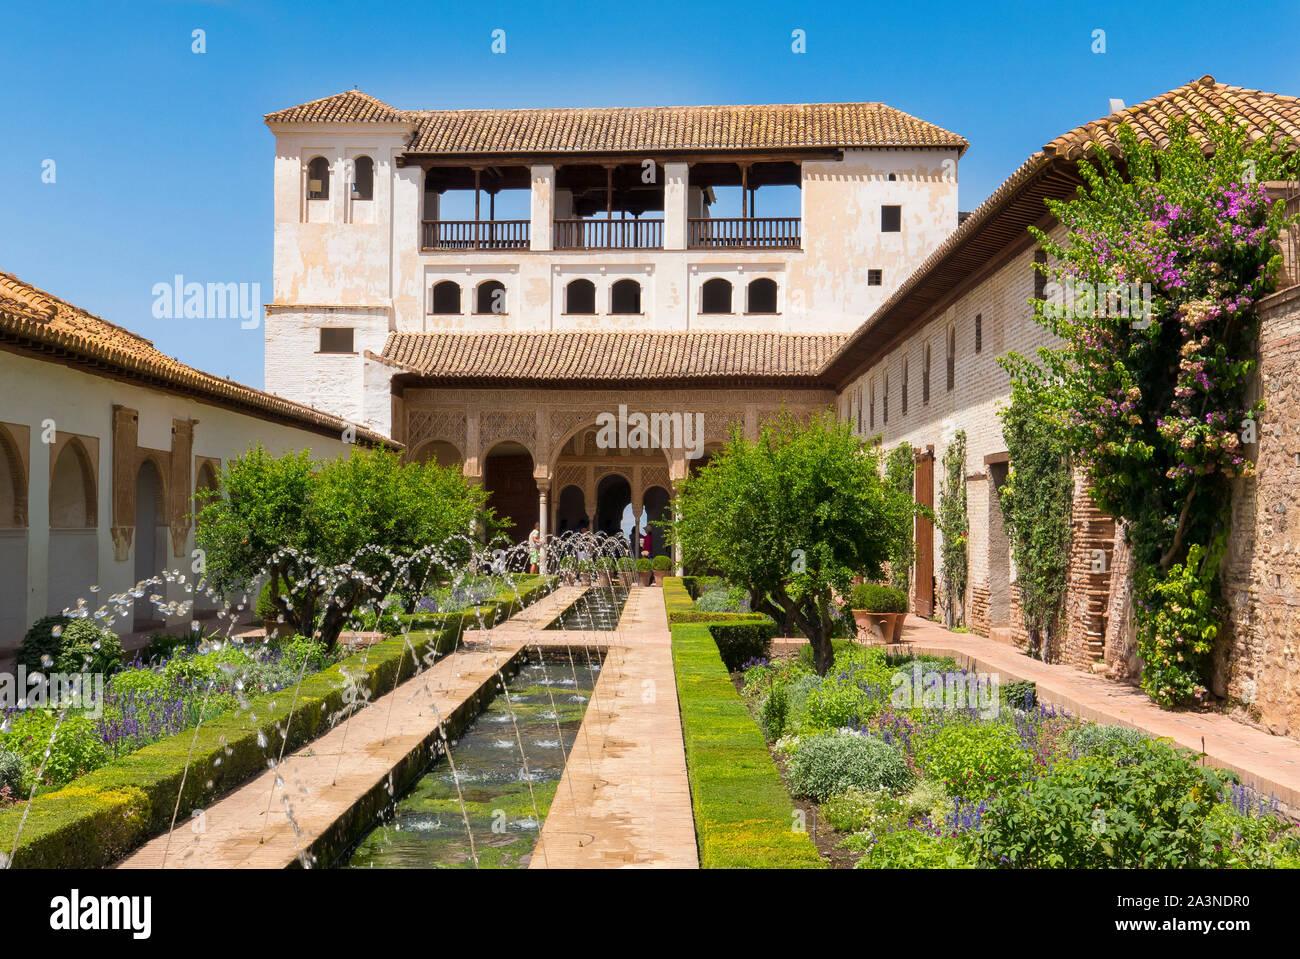 GeneralIfe Gardens at the Alhambra in Granada Spain Stock Photo